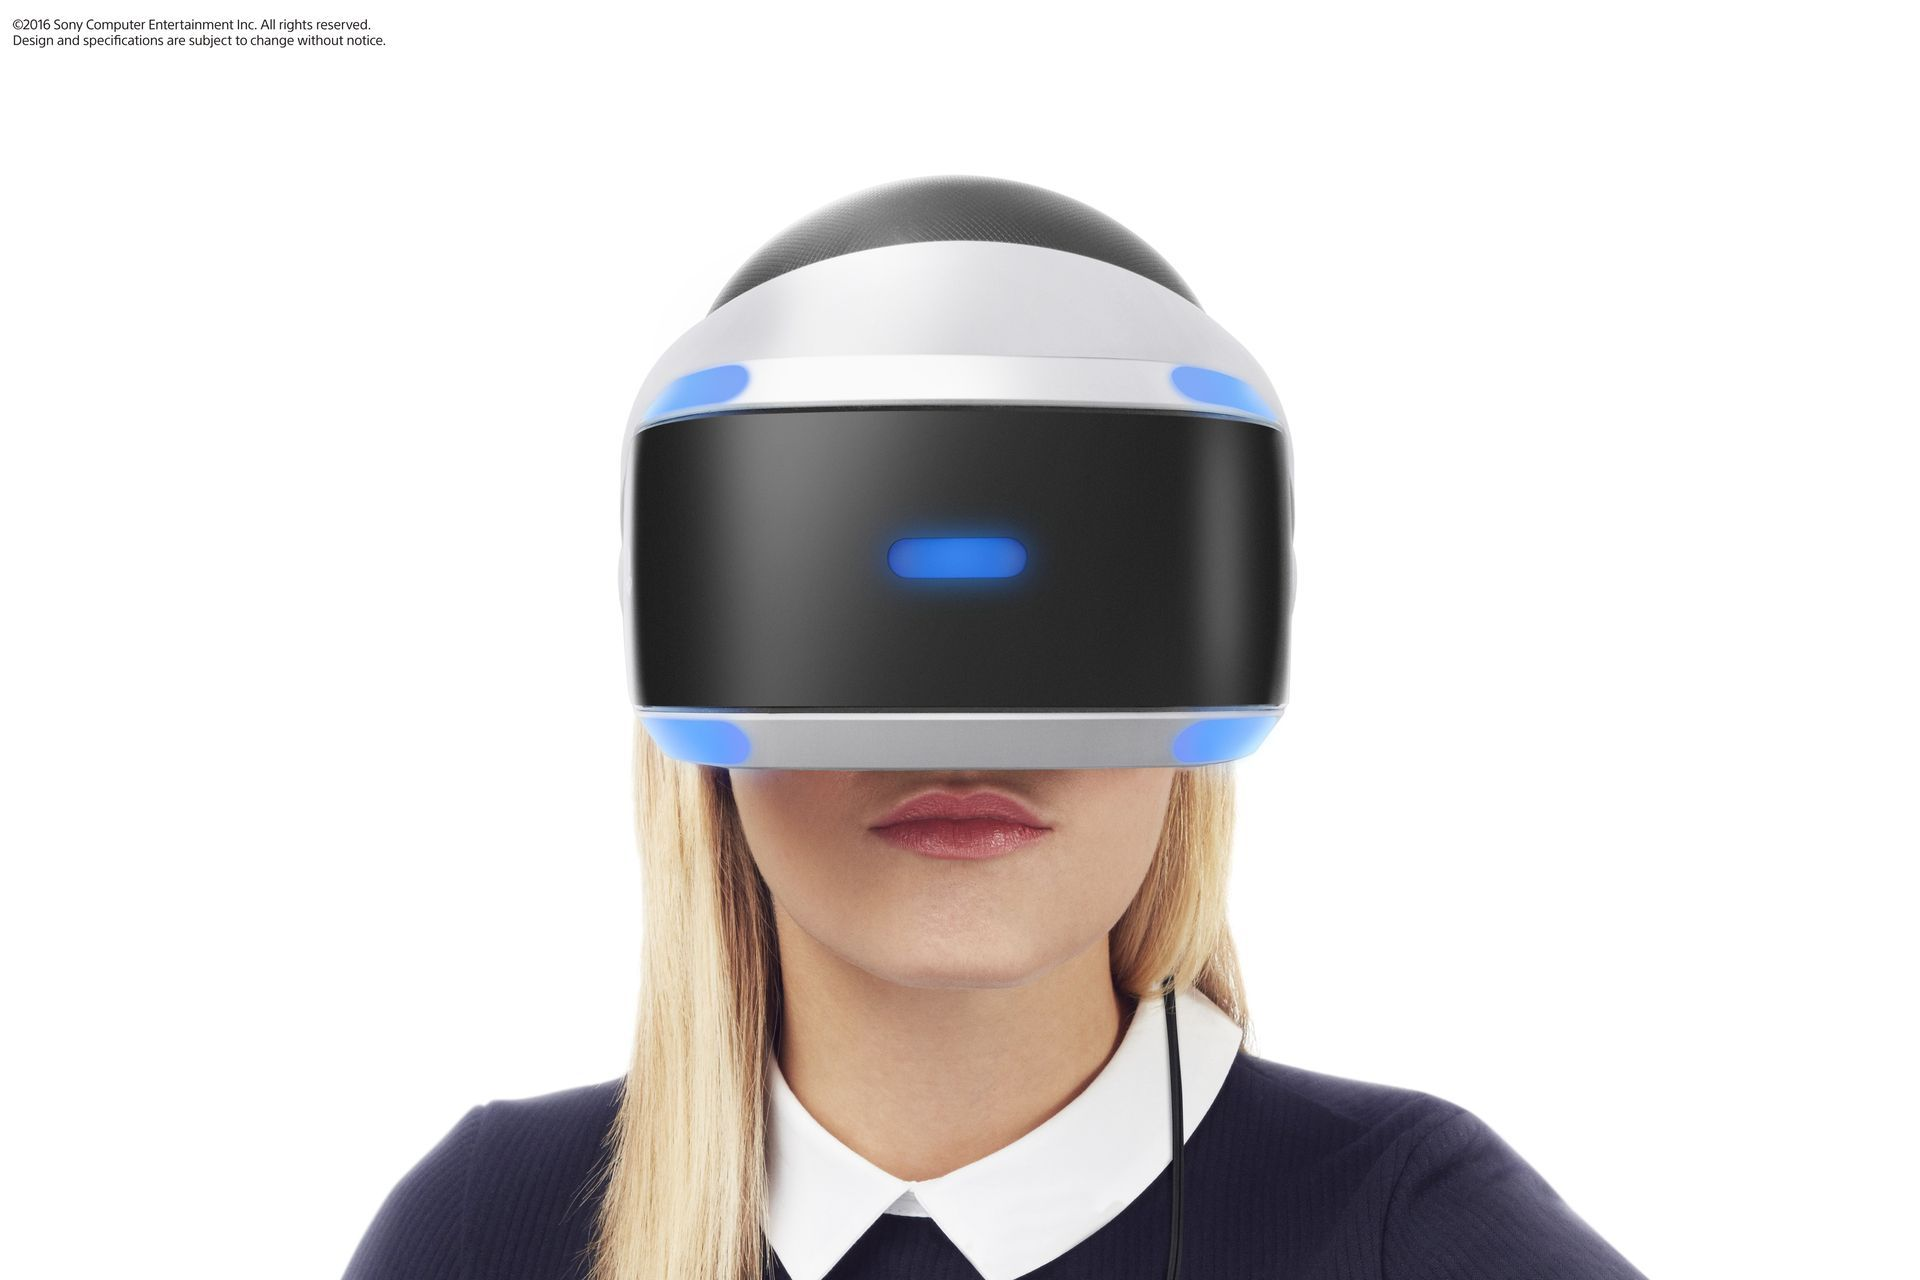 PlayStation VR : le plus abordable des casques VR sortira en octobre prochain en France